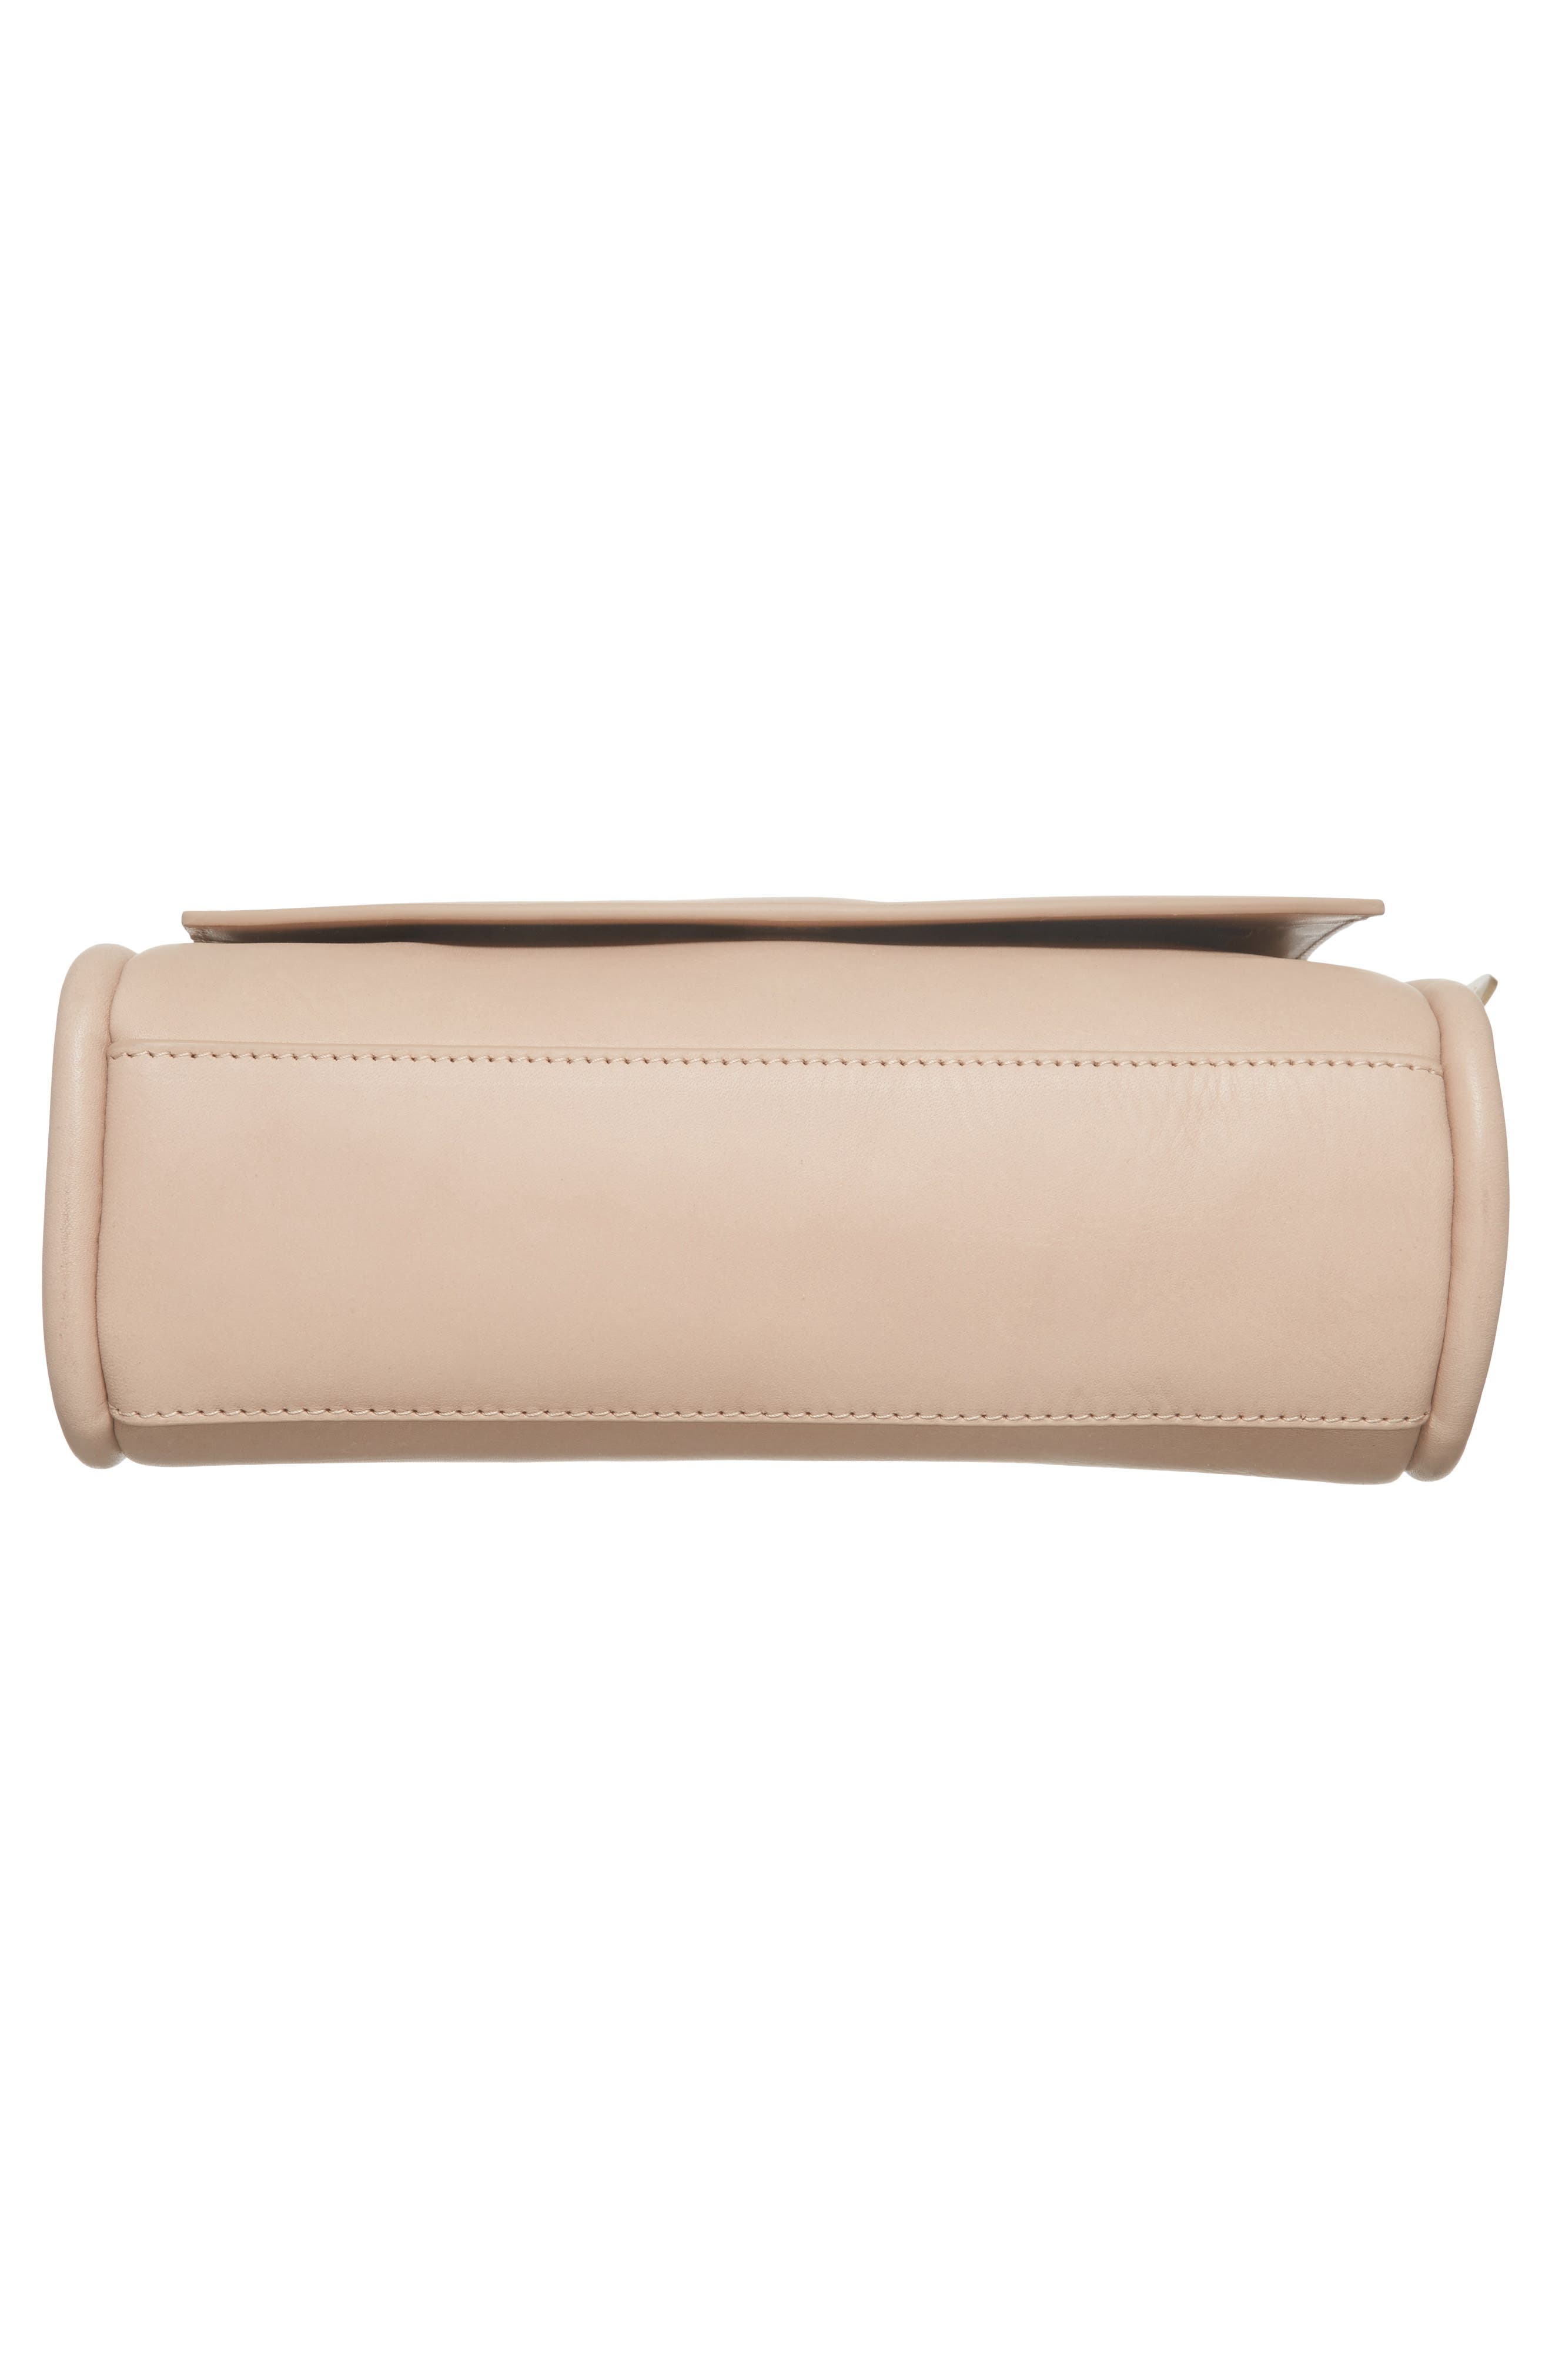 Sylvi Calfskin Leather Crossbody Bag,                             Alternate thumbnail 5, color,                             Beige